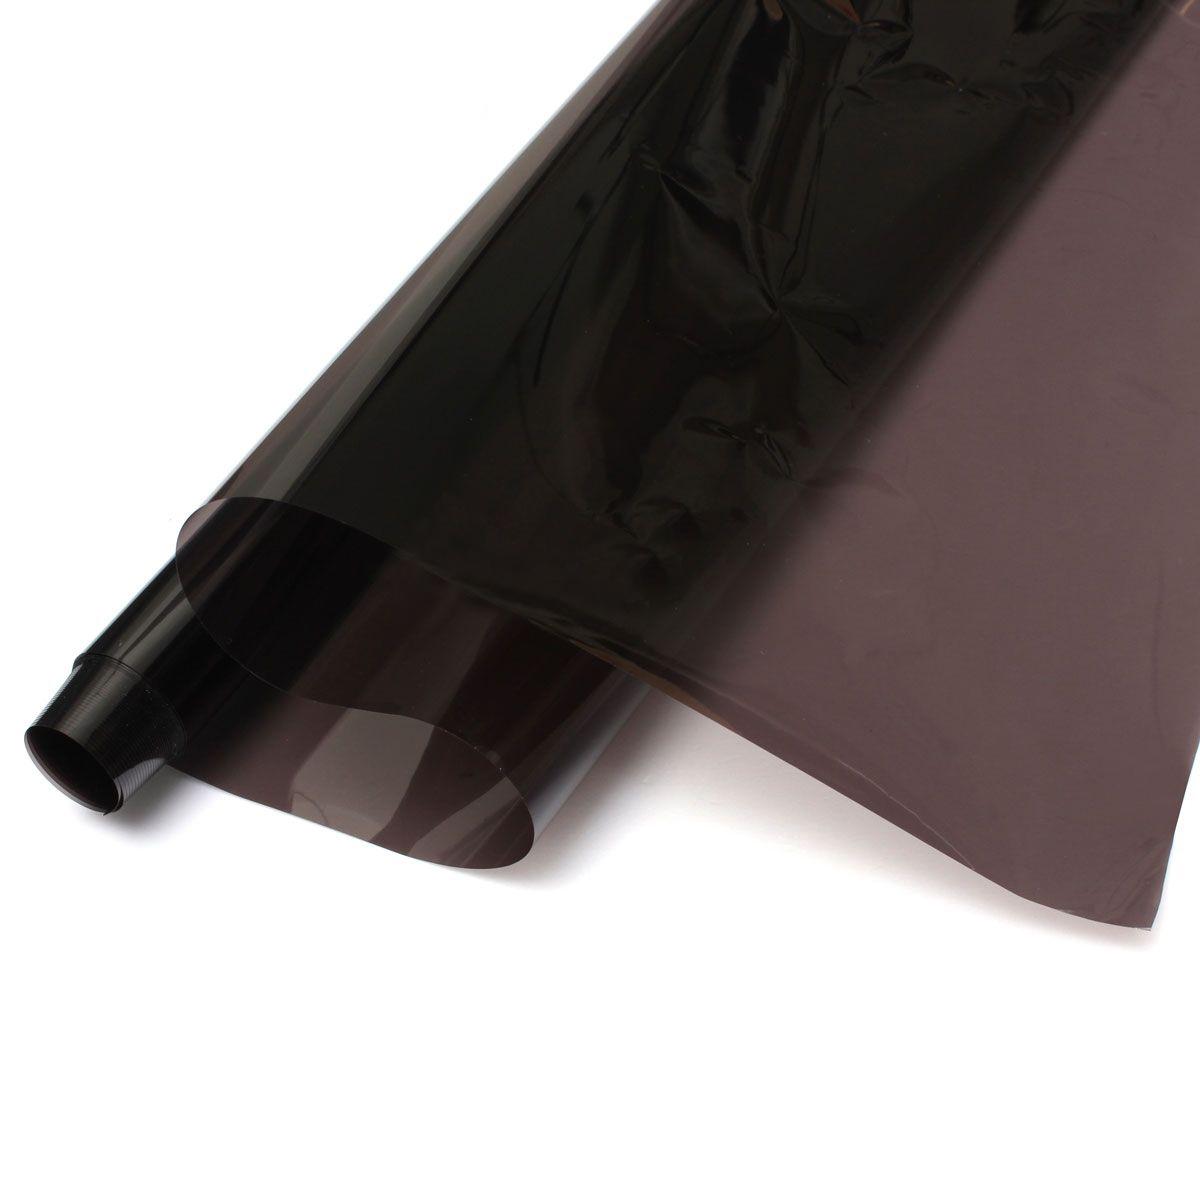 car auto home window glass tint film tinting vlt ultra limo black 3mx50cm d1m5 ebay. Black Bedroom Furniture Sets. Home Design Ideas